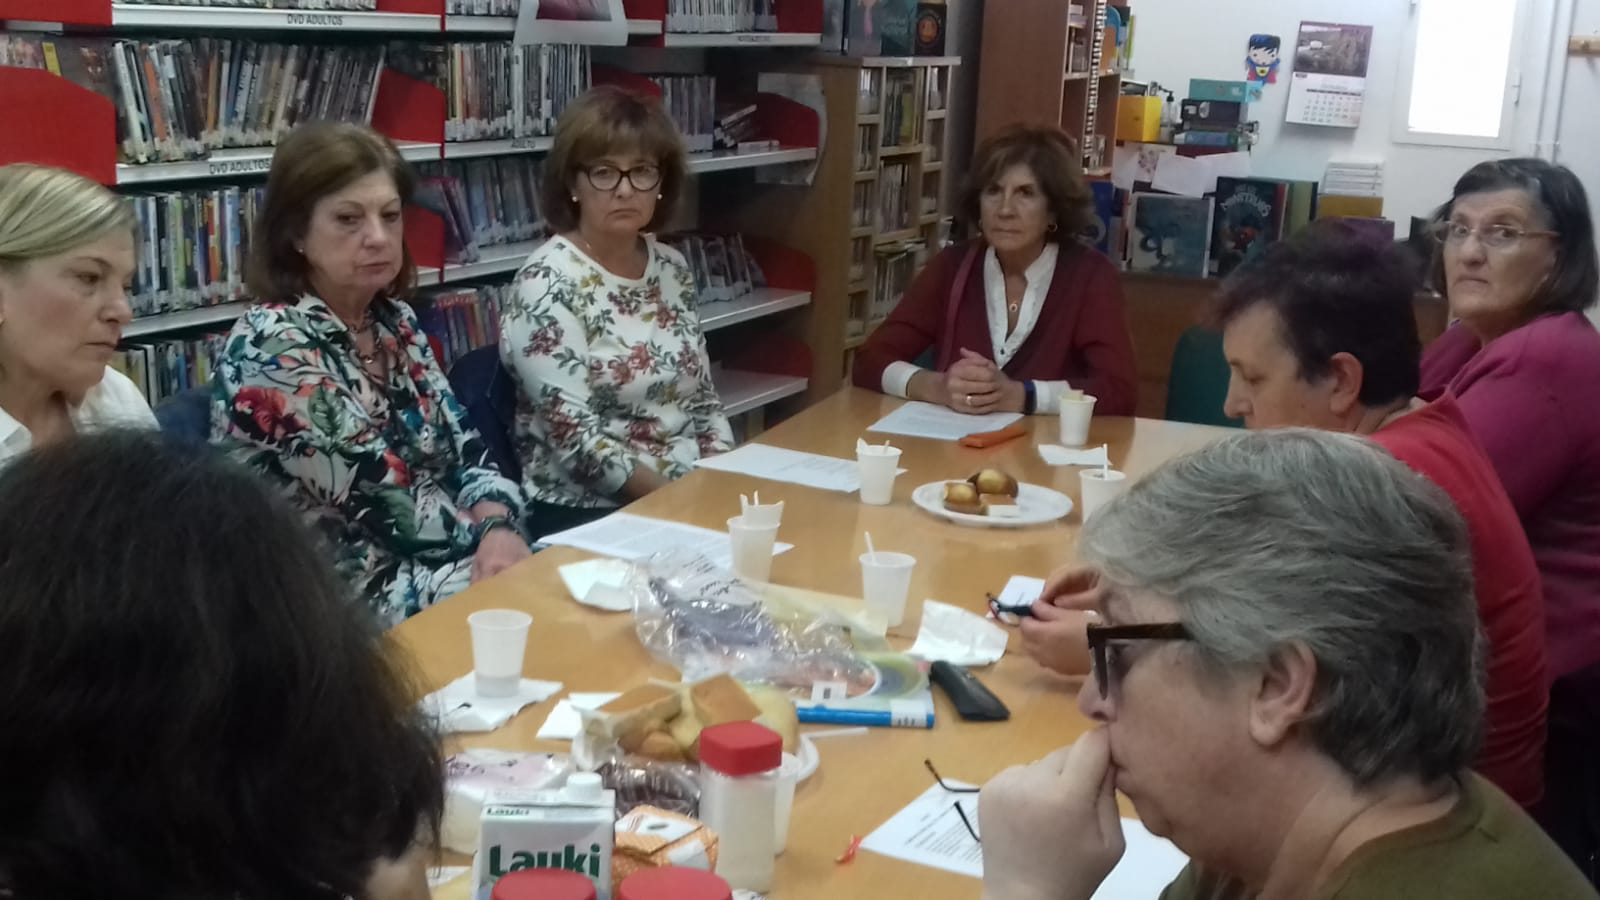 Biblioteca Municipal de Sacedón (Guadalajara)